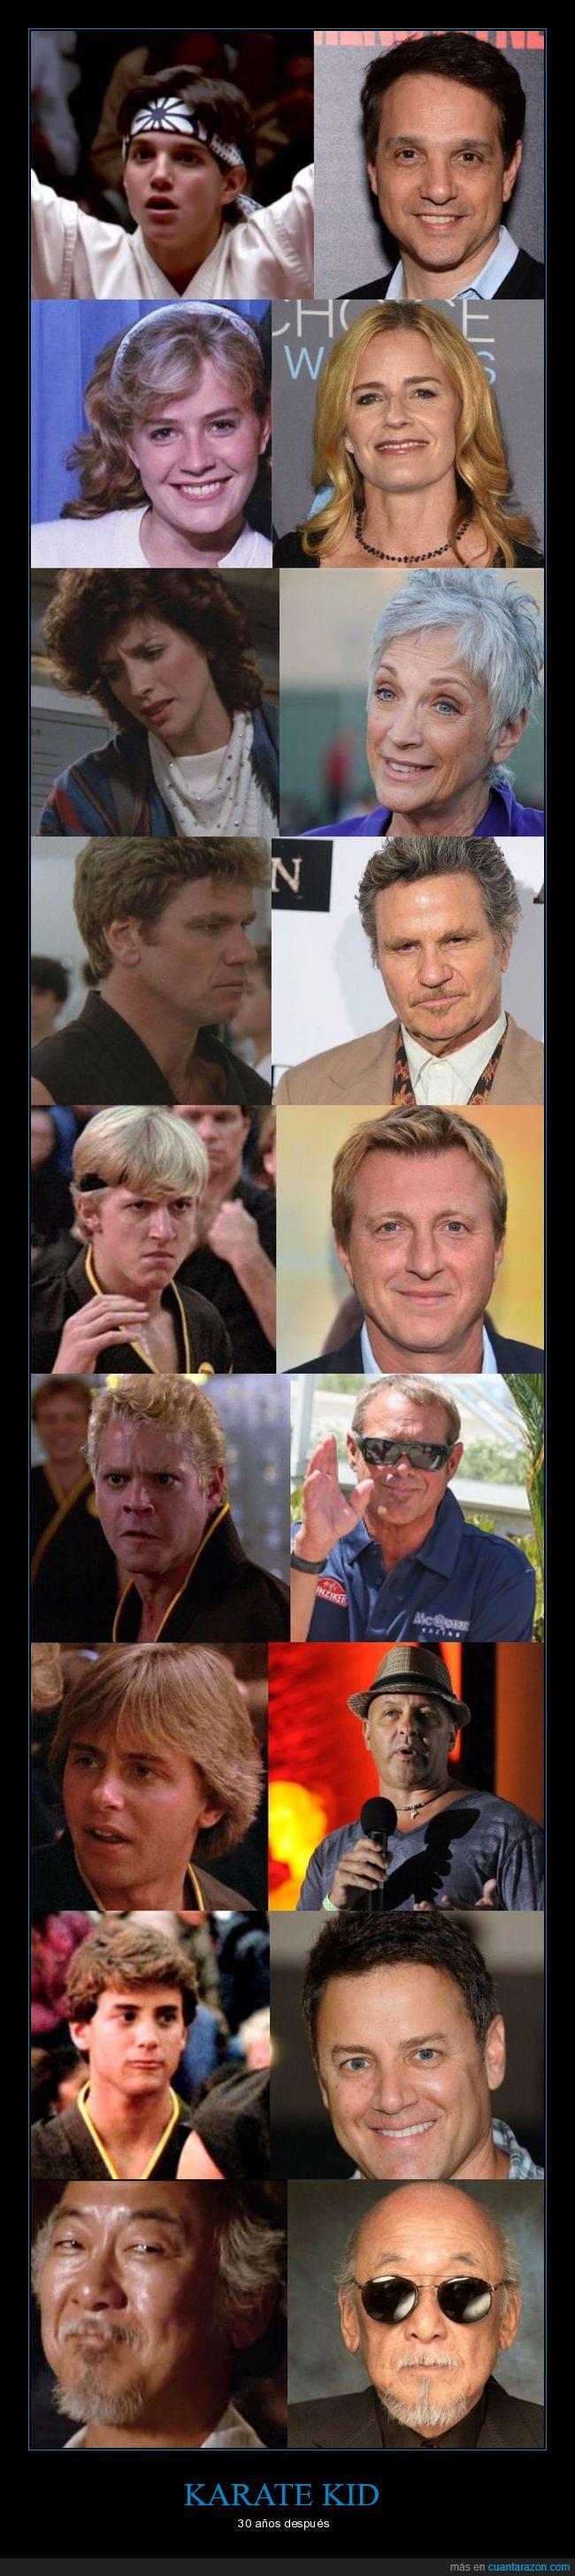 edad,karate kid,película,saga,viejos